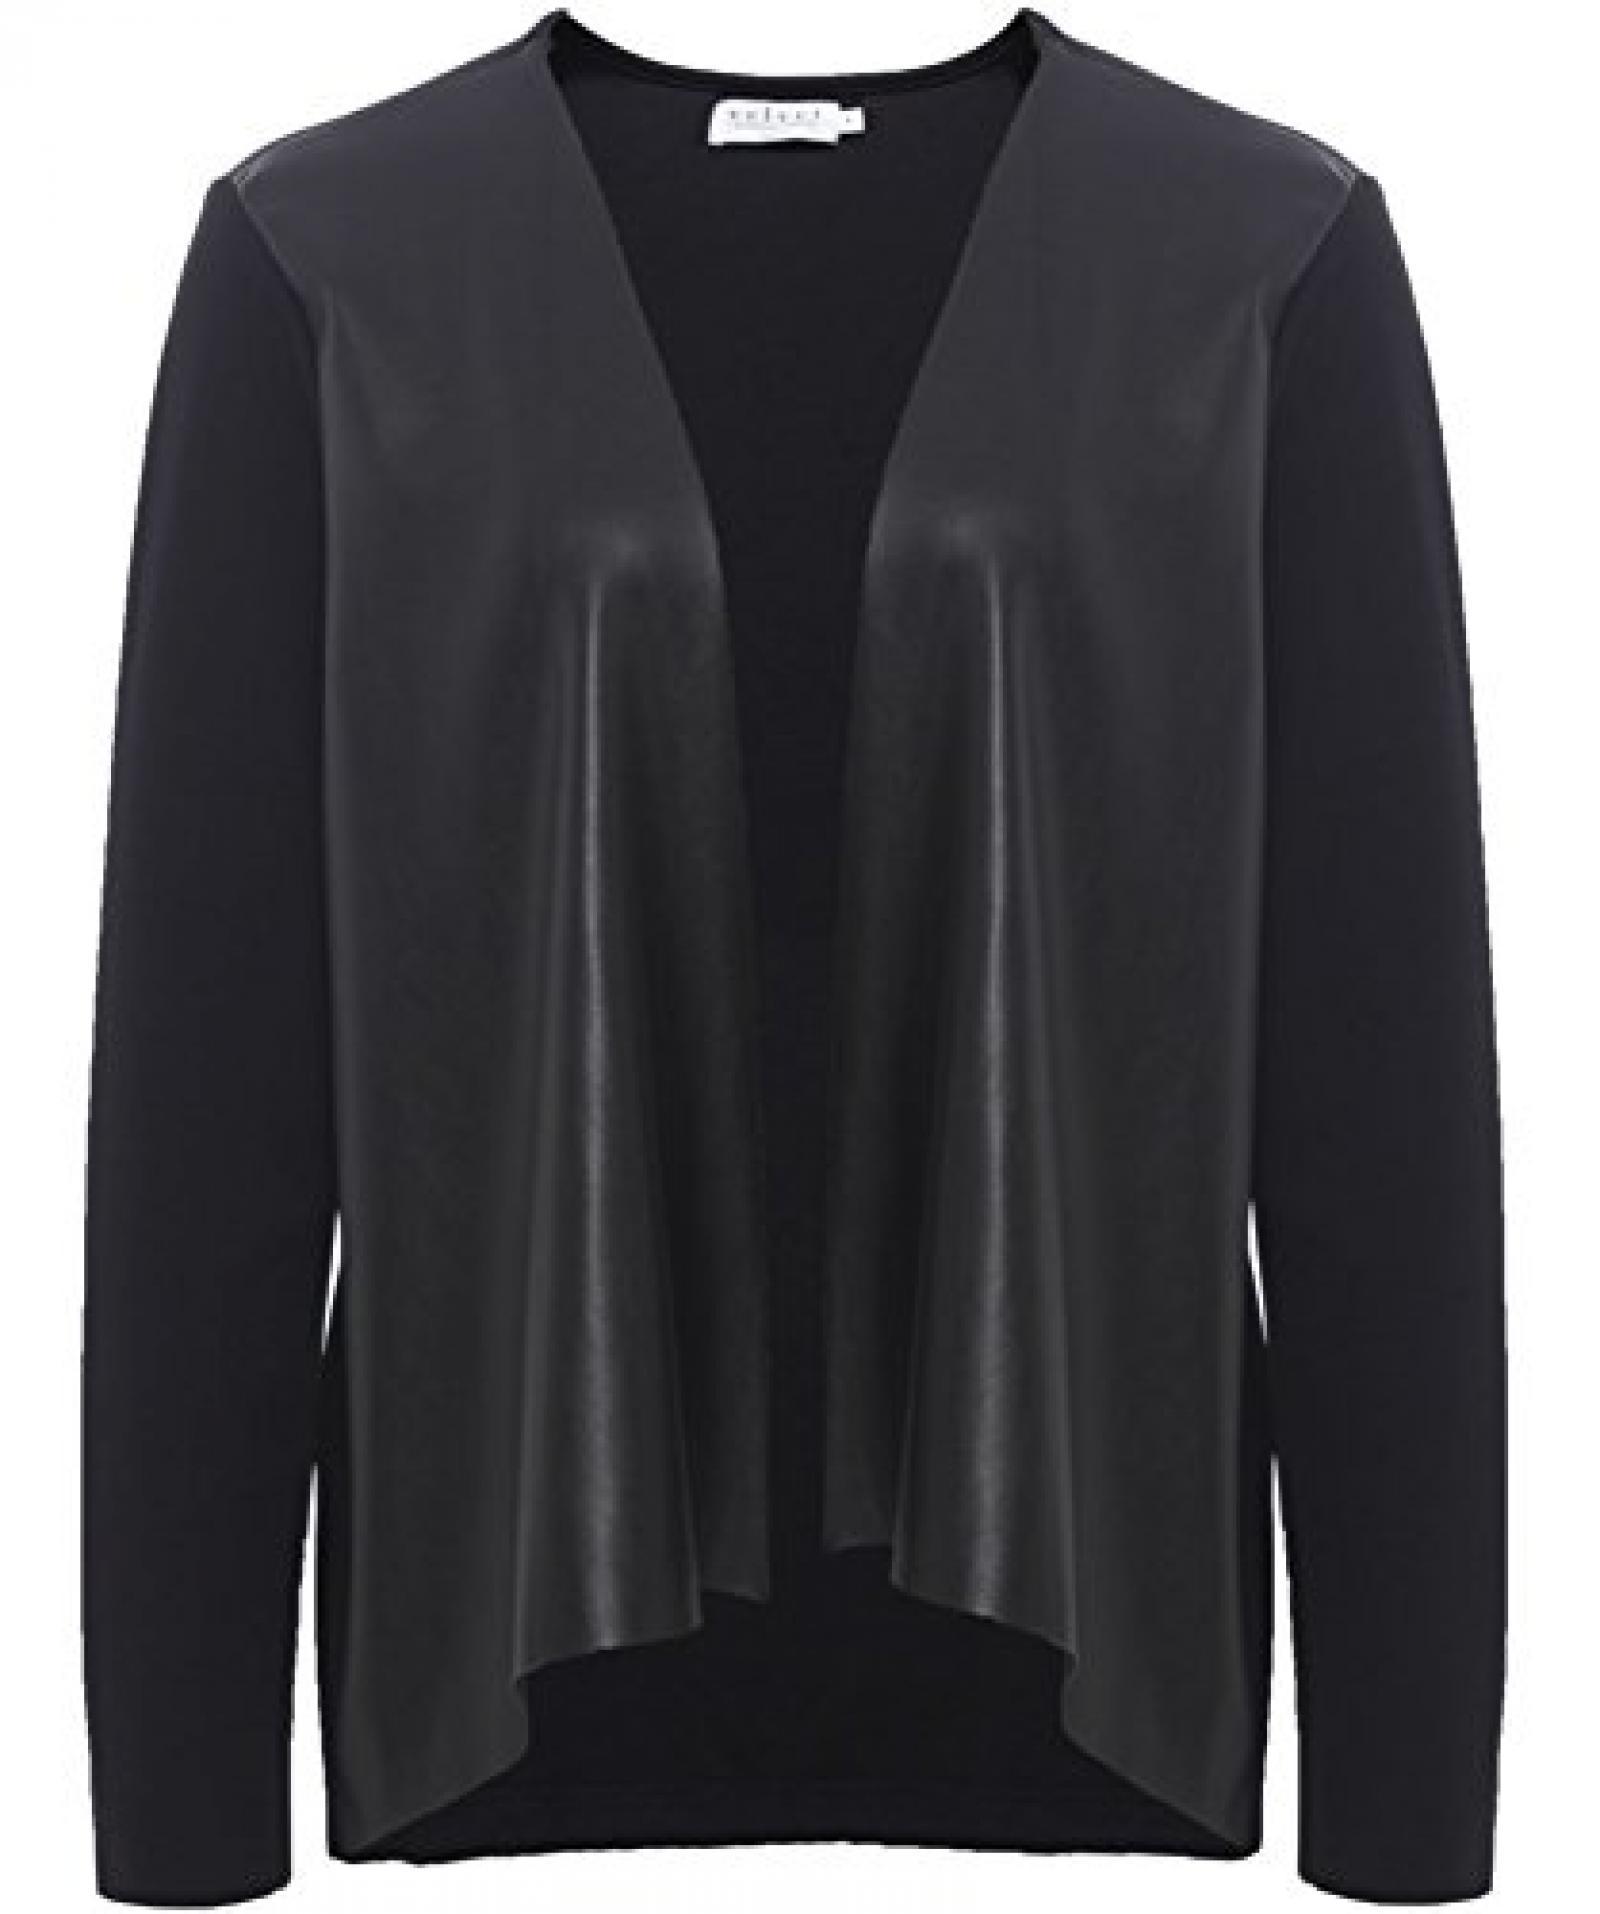 Velvet Candy Leather Ponti Jacket Schwarz